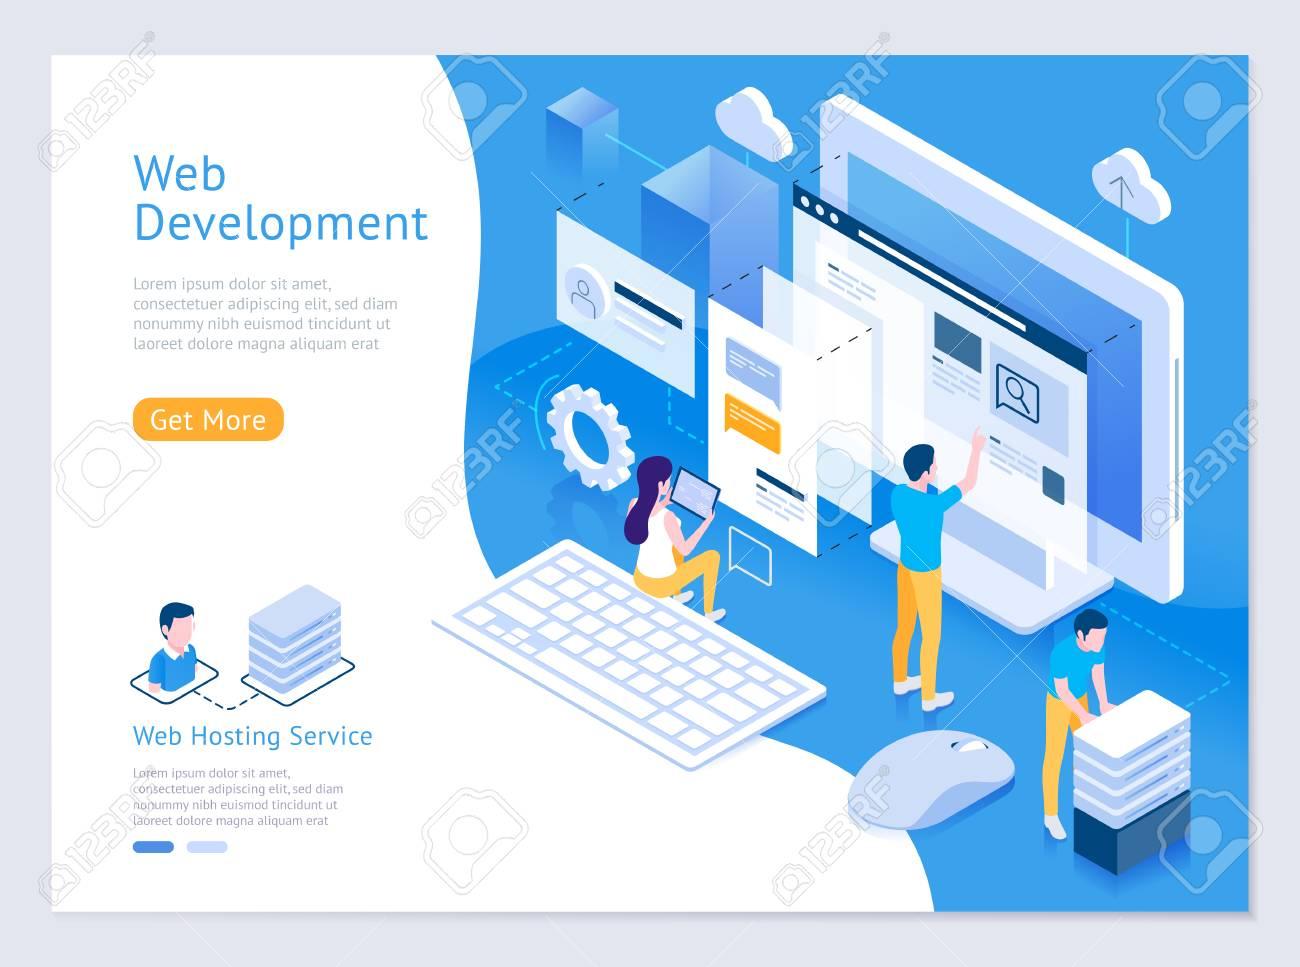 Web design and development vector isometric illustrations. - 106089921